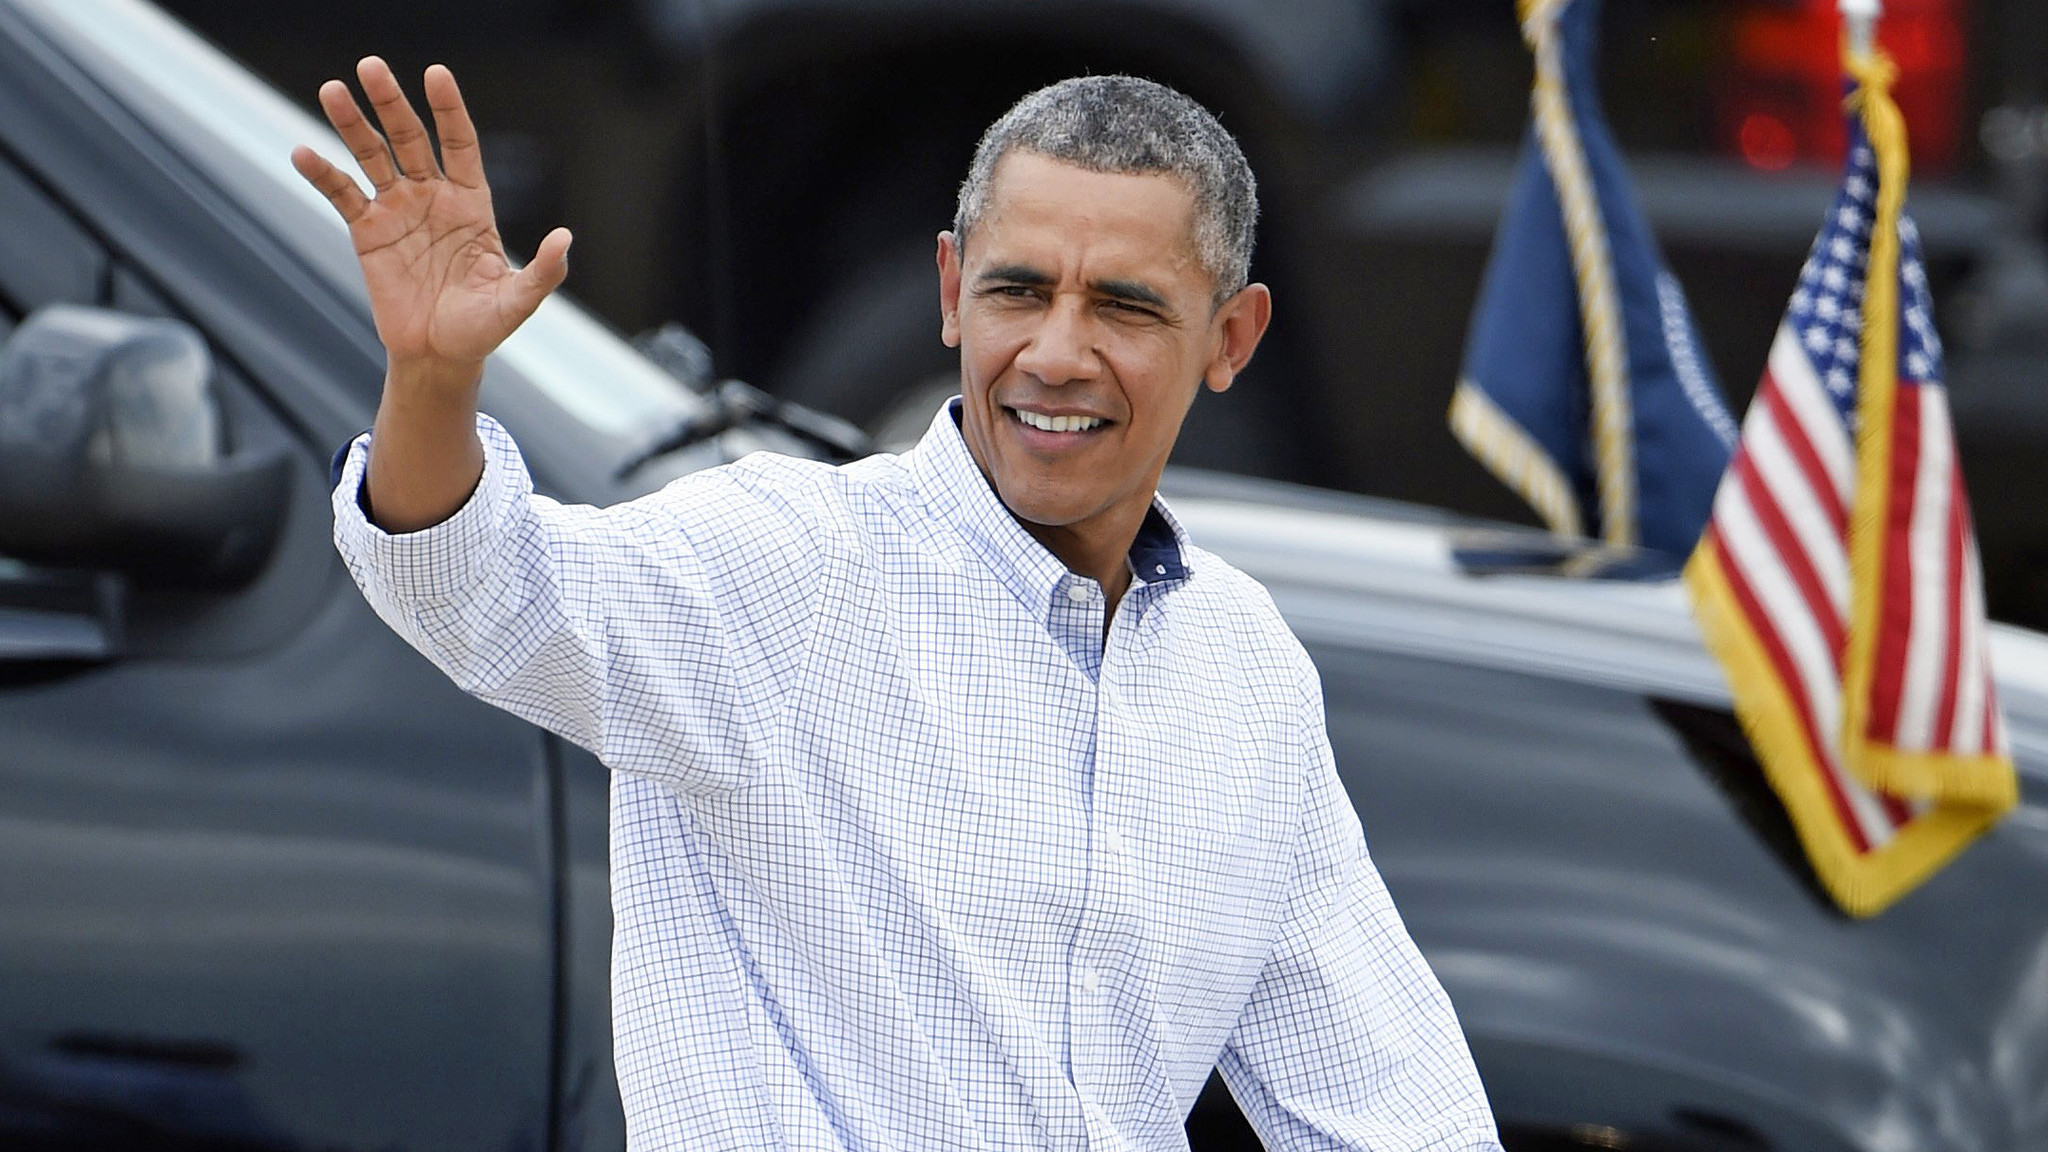 President Obama in San Diego on Monday. (Denis Poroy / Associated Press) ()